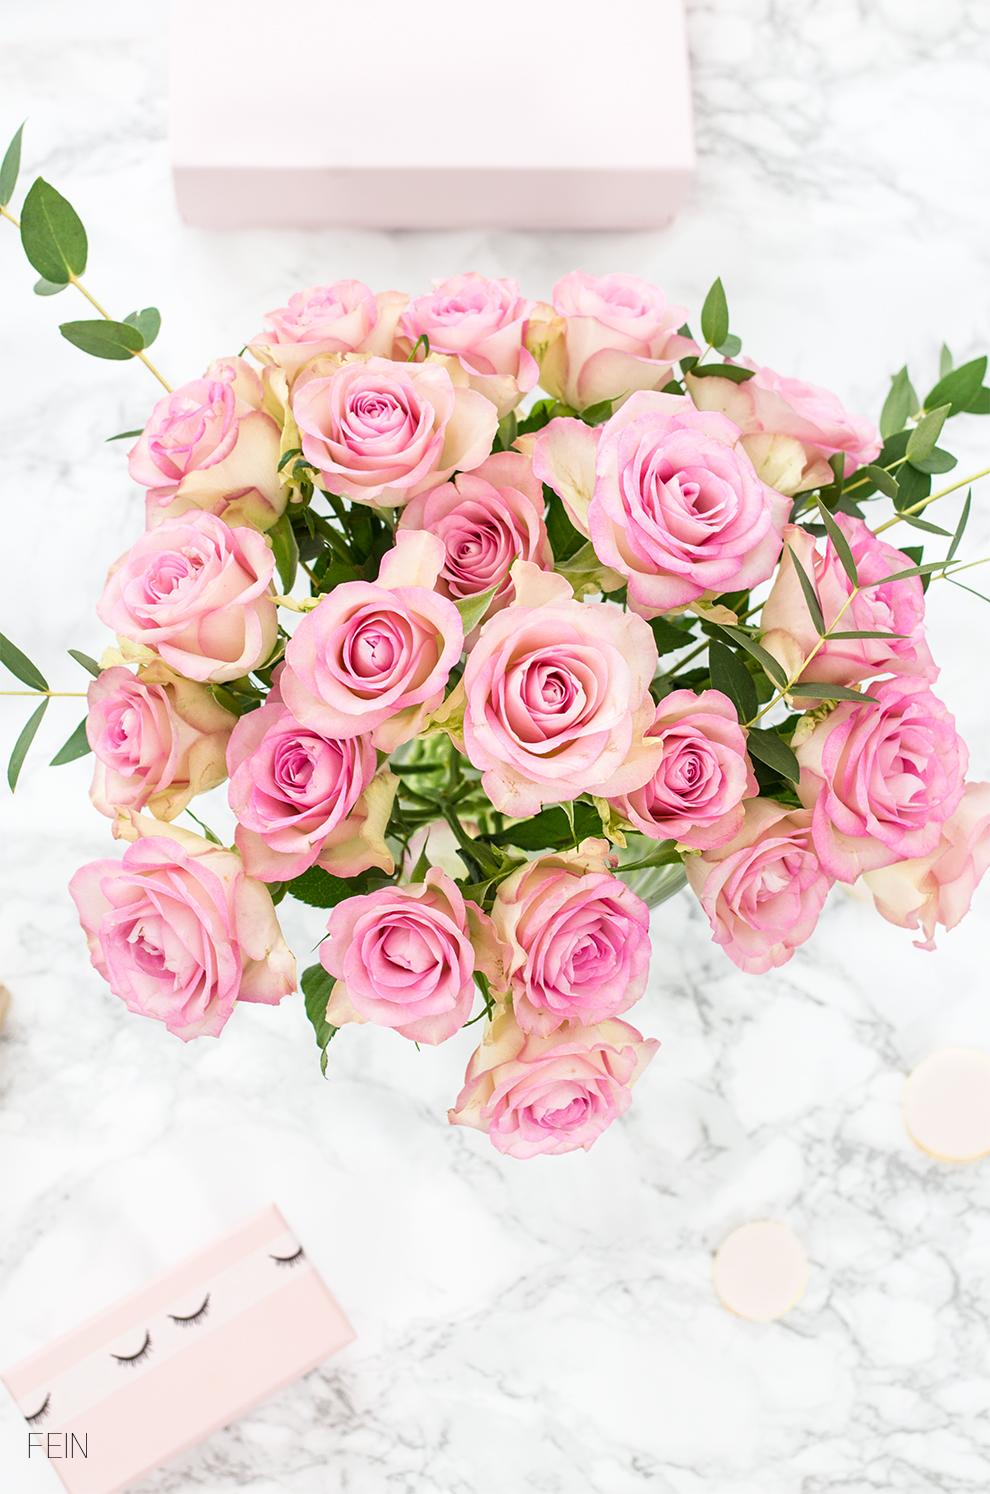 rosa-accessoires-rosen